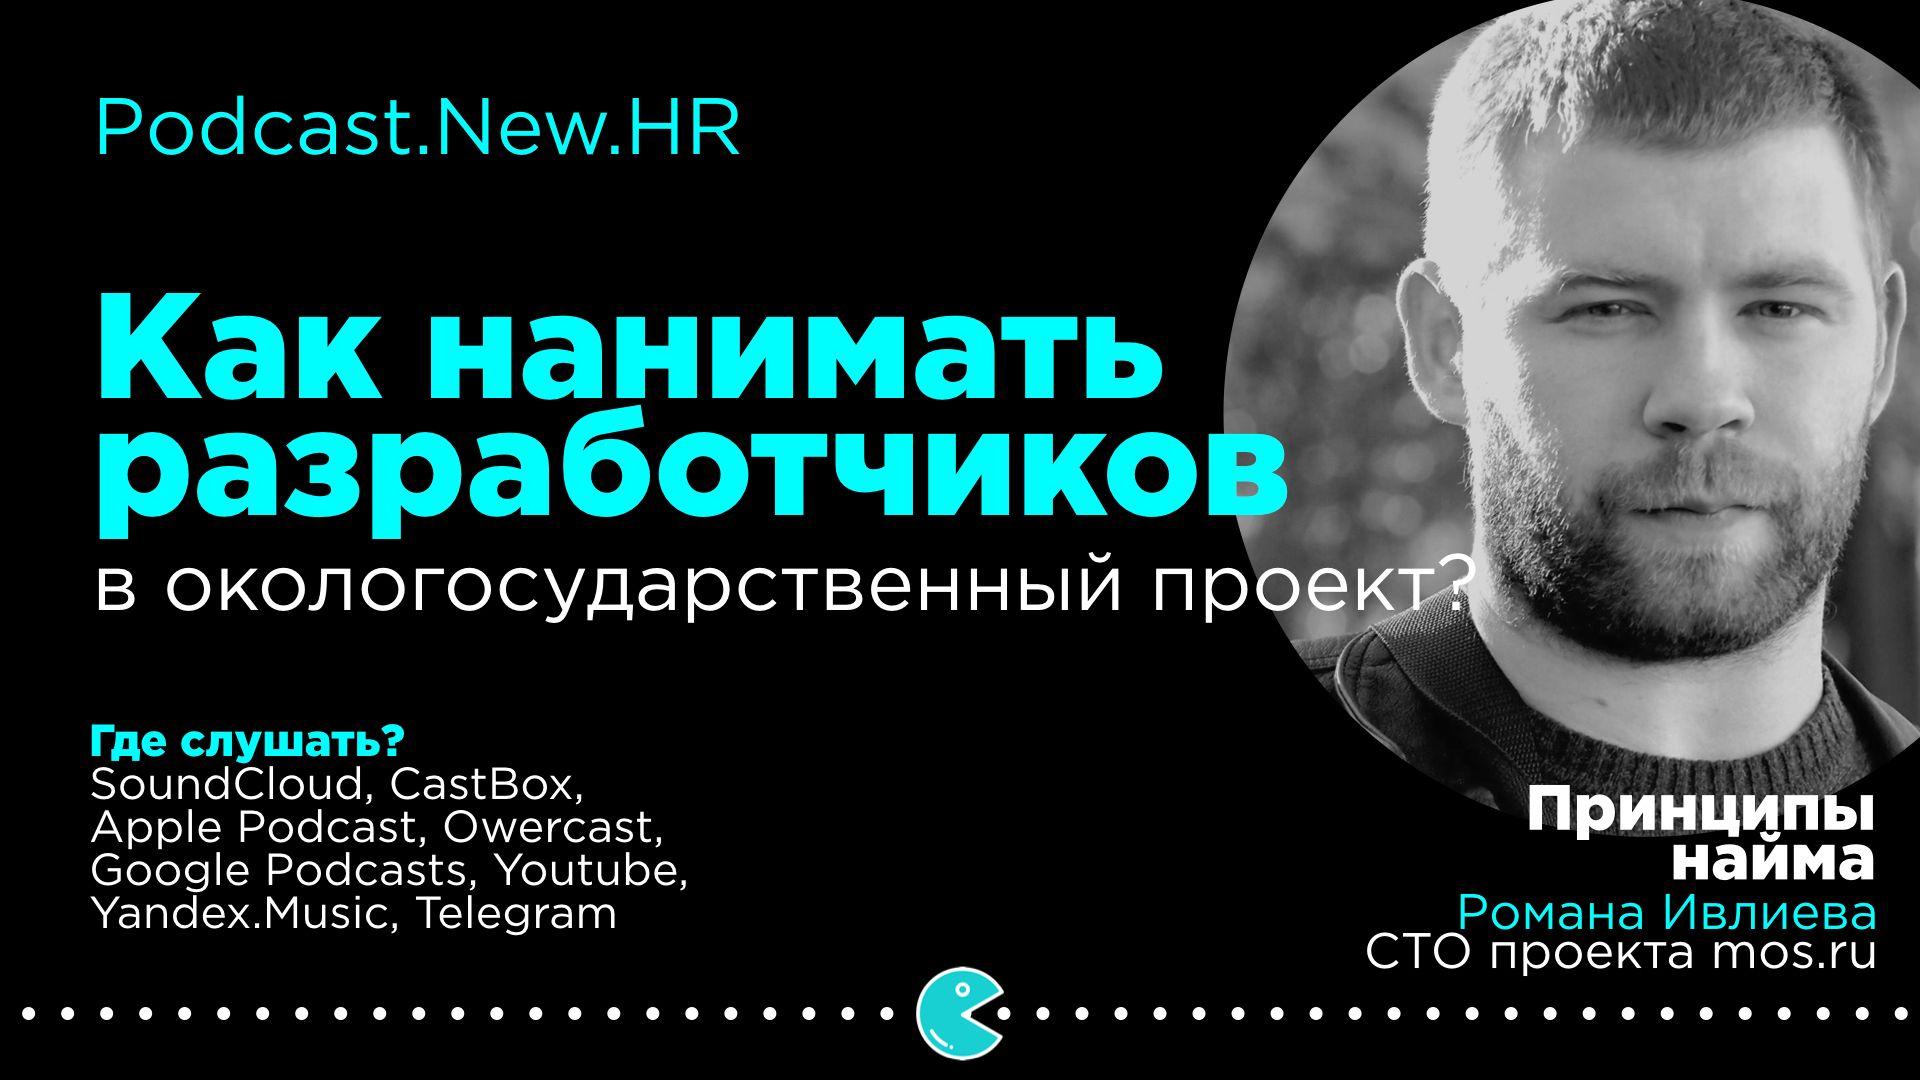 Принципы найма Романа Ивлиева, CTO mos.ru